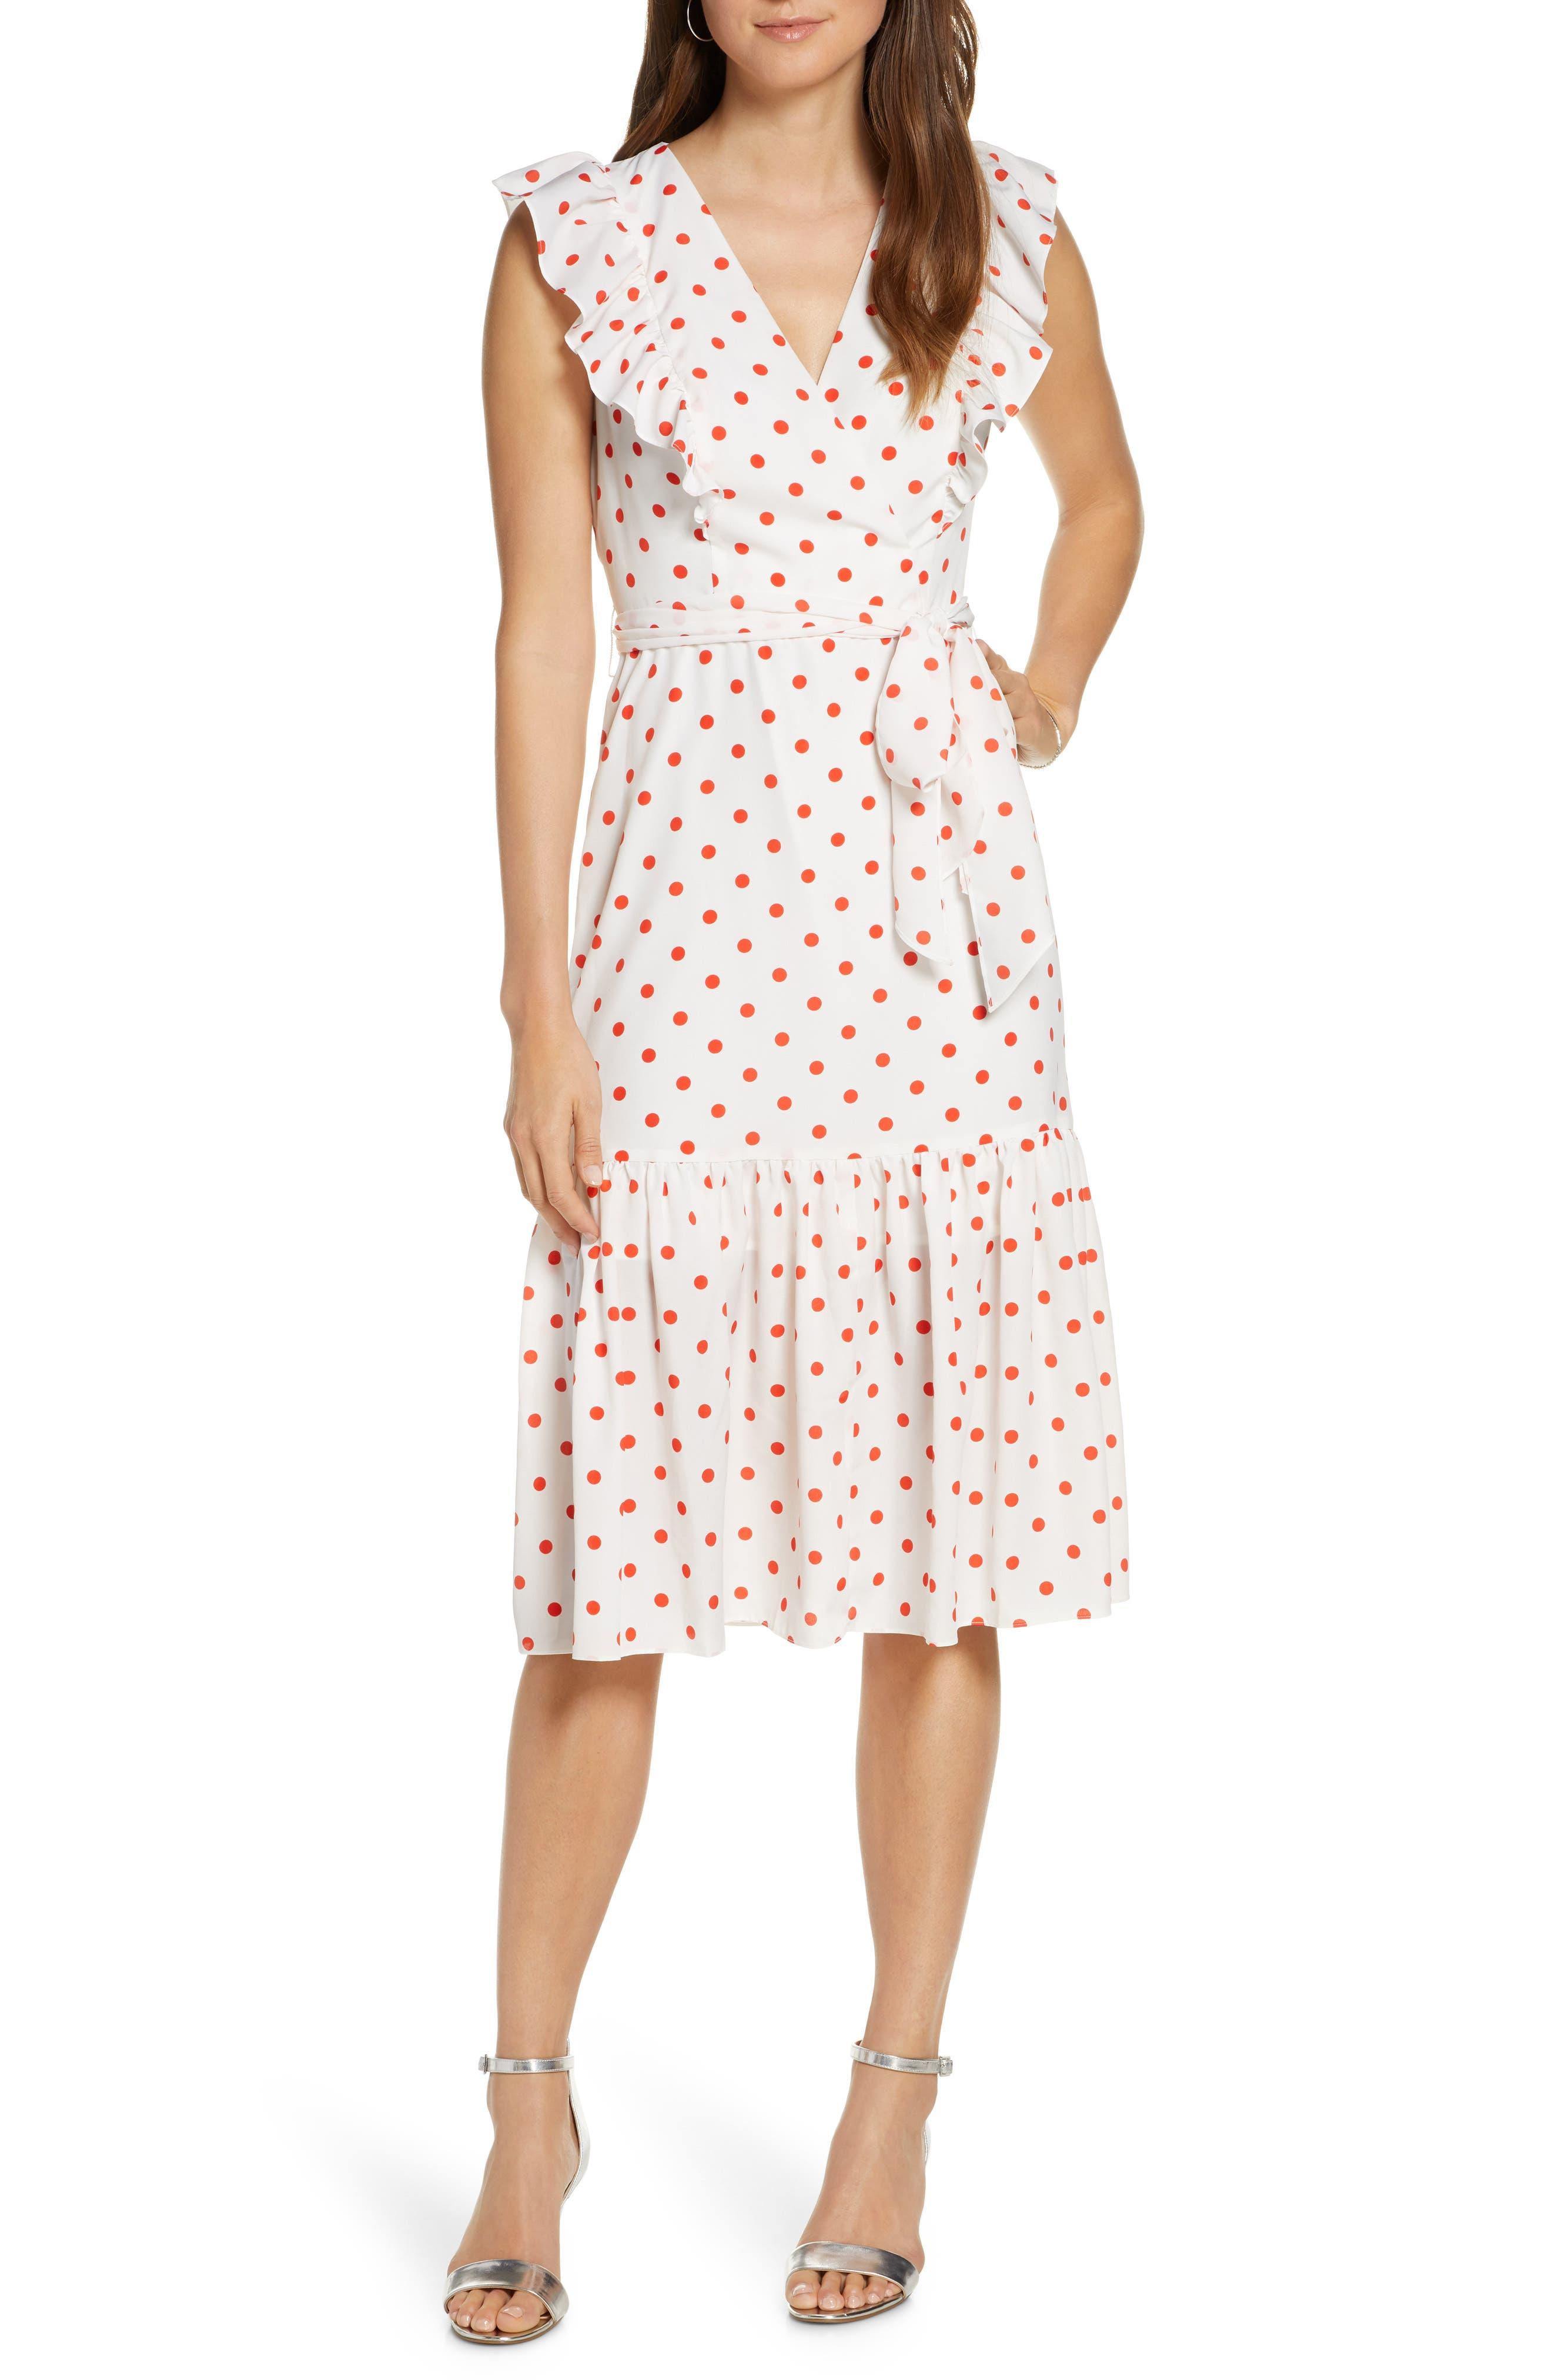 1930s Day Dresses, Tea Dresses, House Dresses Womens 1901 Ruffle Front Polka Dot Tie Waist Dress $149.00 AT vintagedancer.com